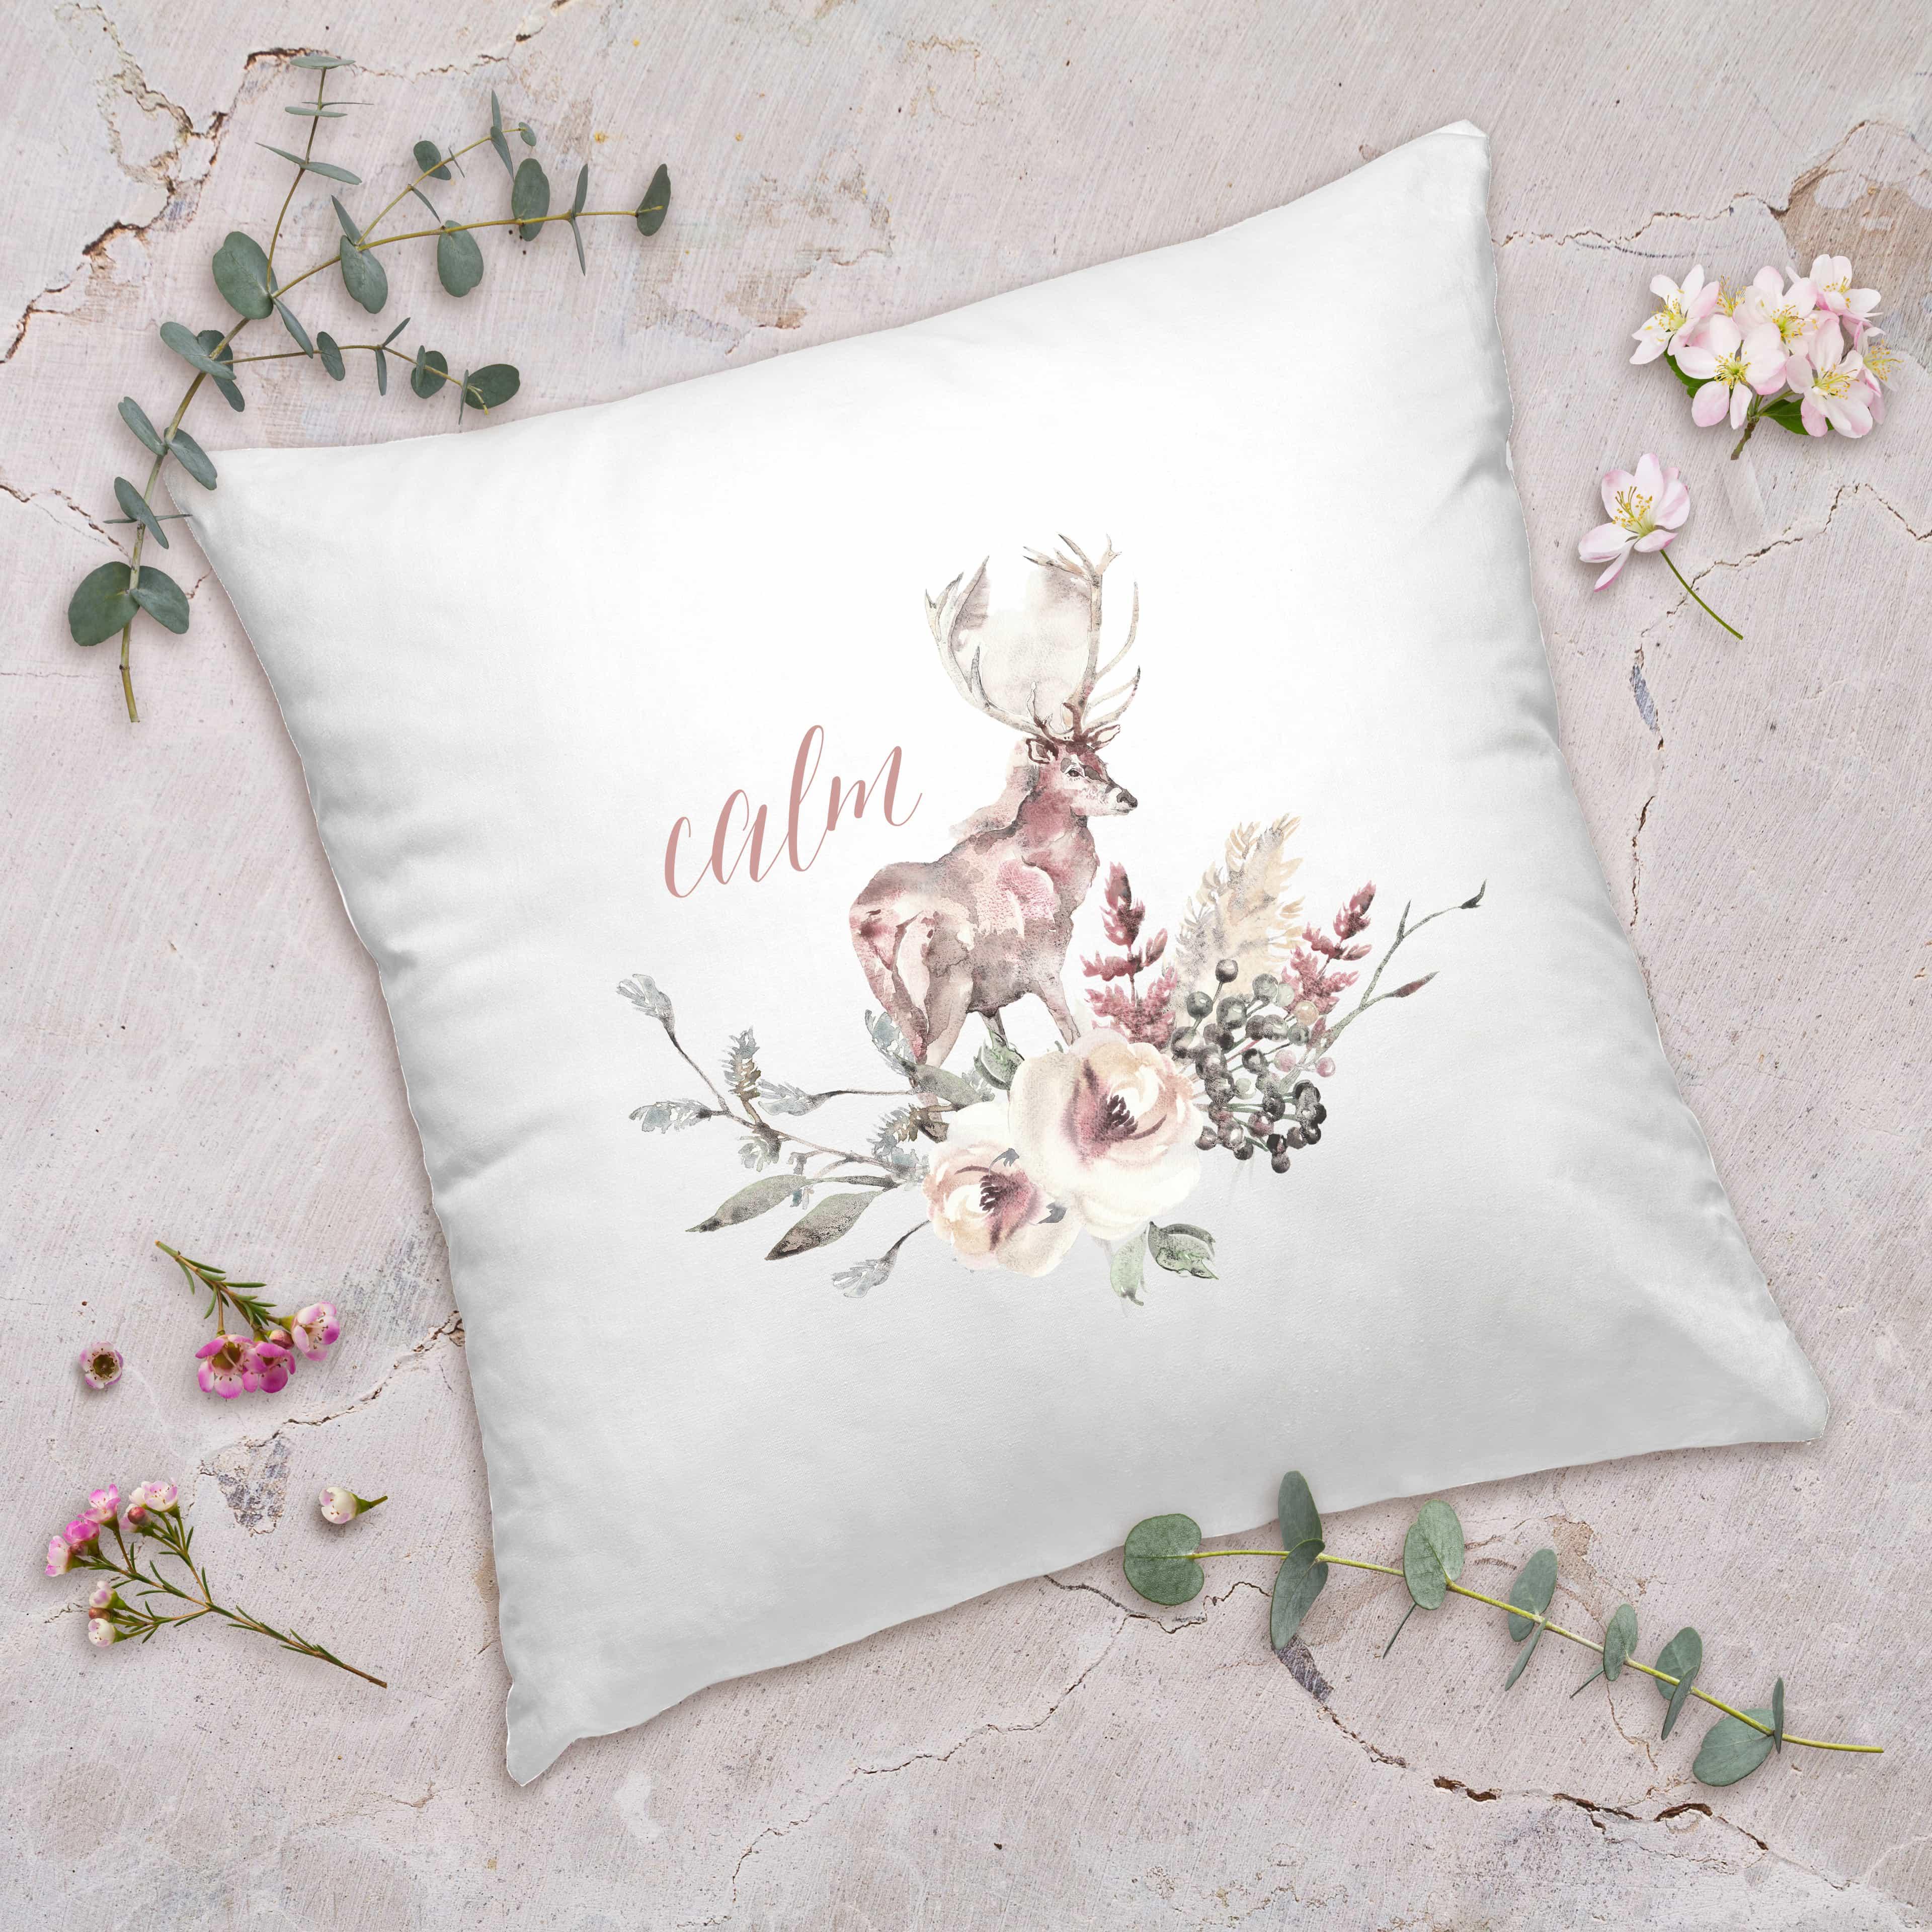 Posh Cottage Shop Winter 19 Calm Stag 18in white pillow